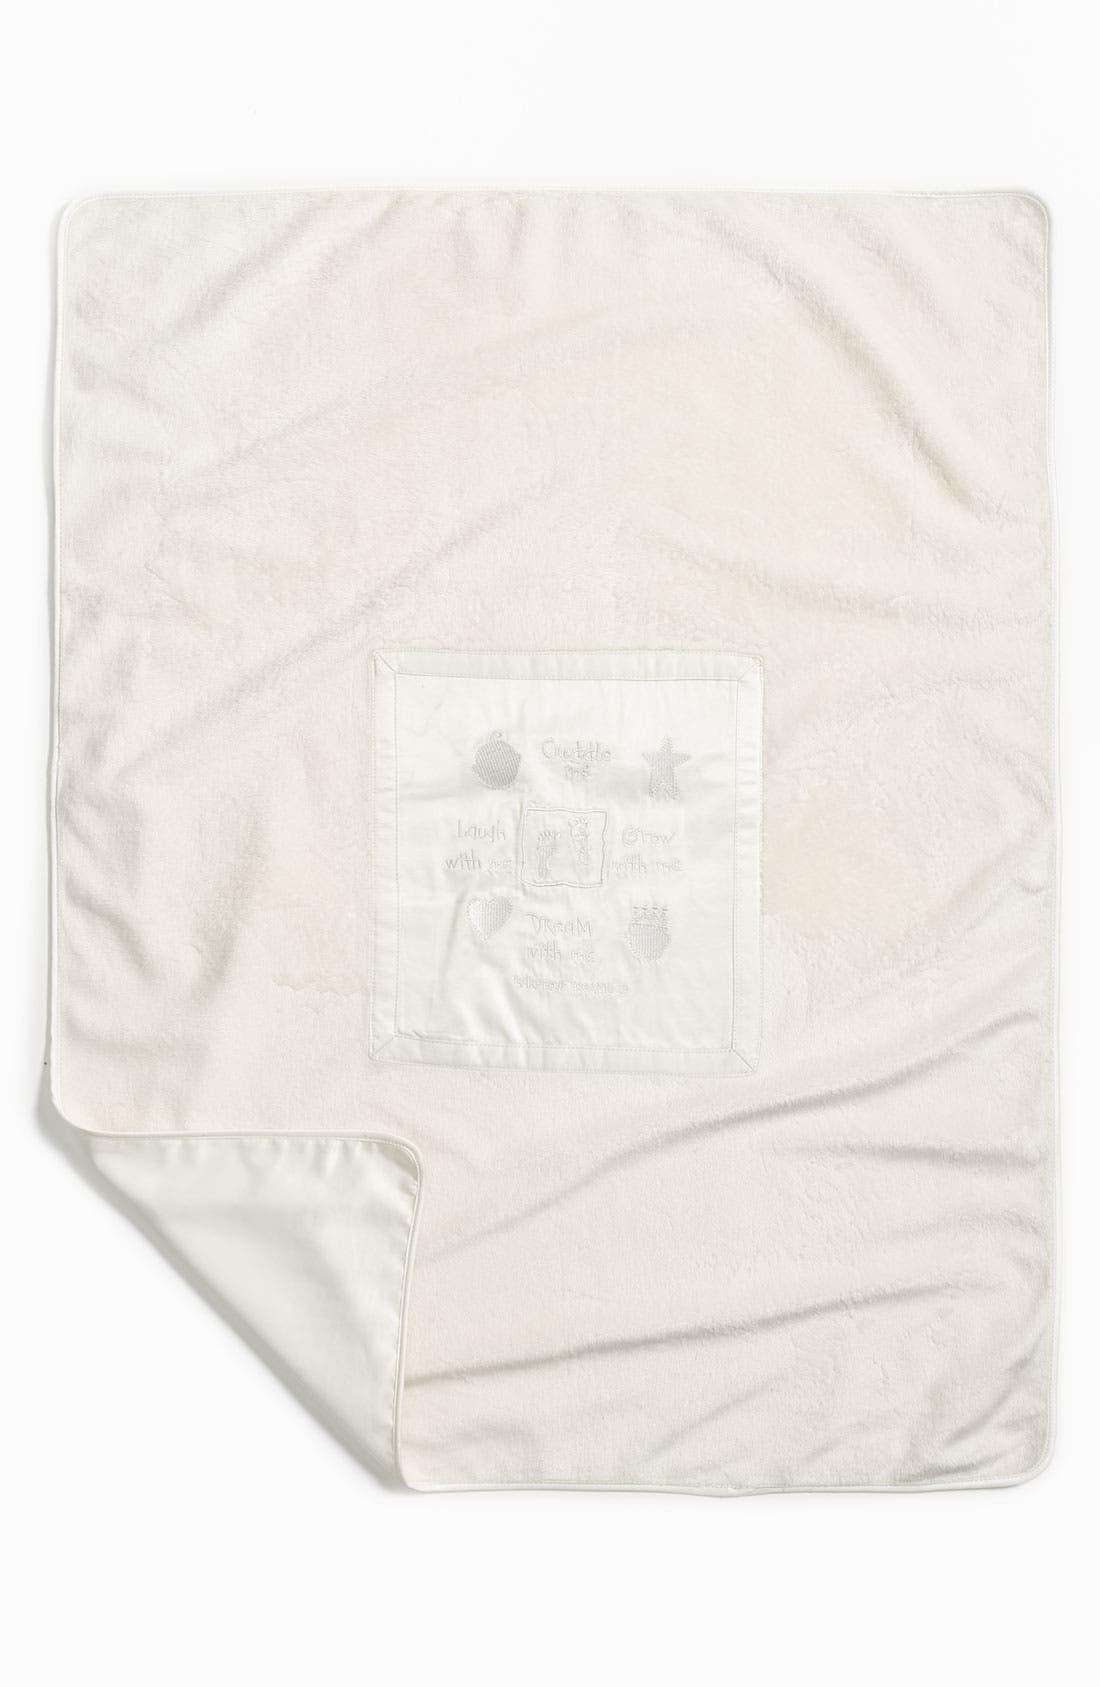 Signature Plush Blanket,                             Main thumbnail 1, color,                             CREAM